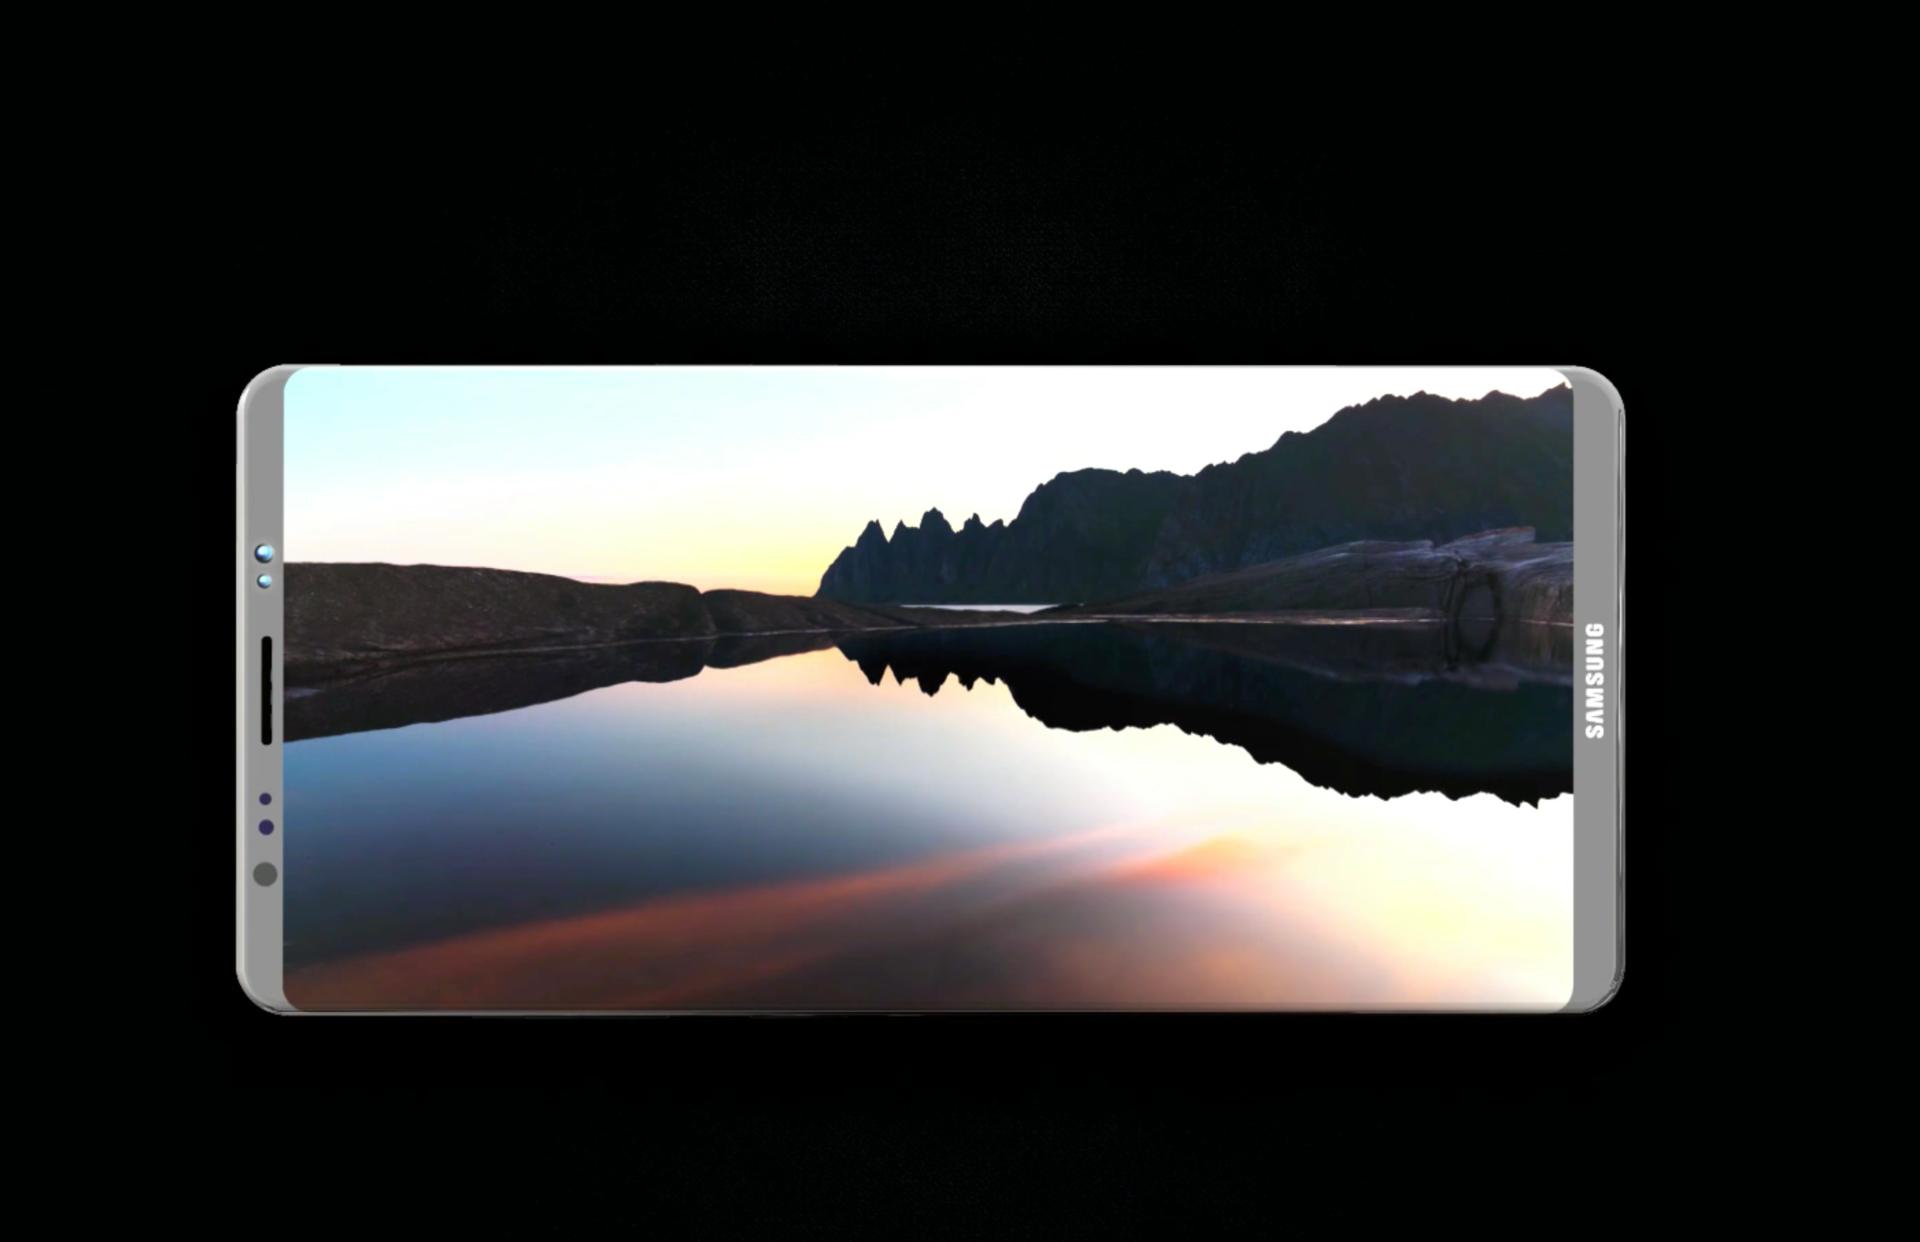 Galaxy Note 8: каким вышел новый флагман Samsung - 1